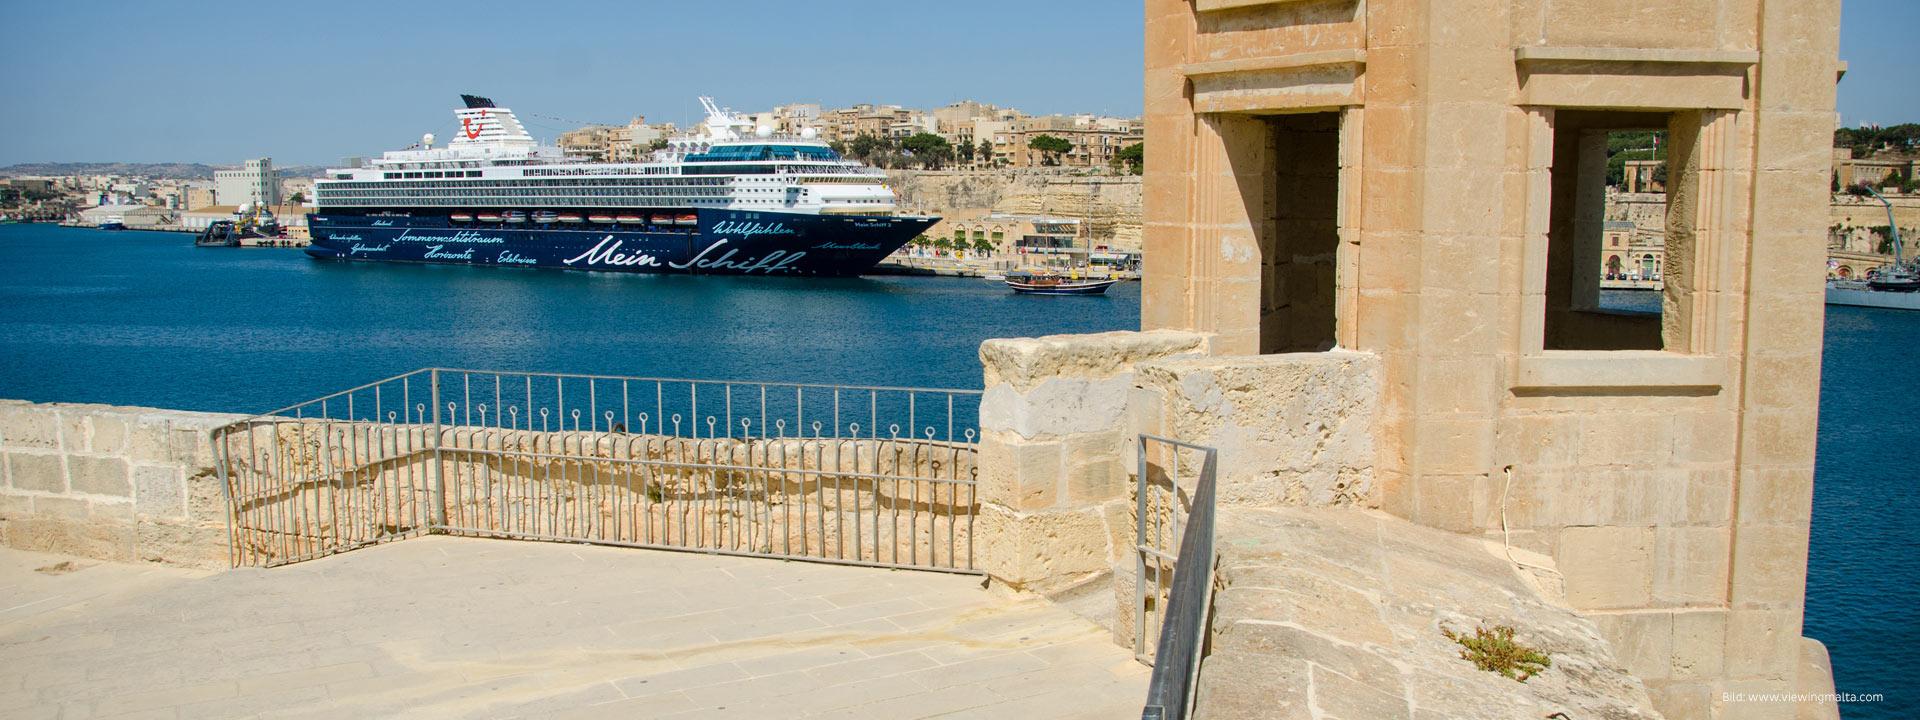 MSIS Stop Over Programm Malta